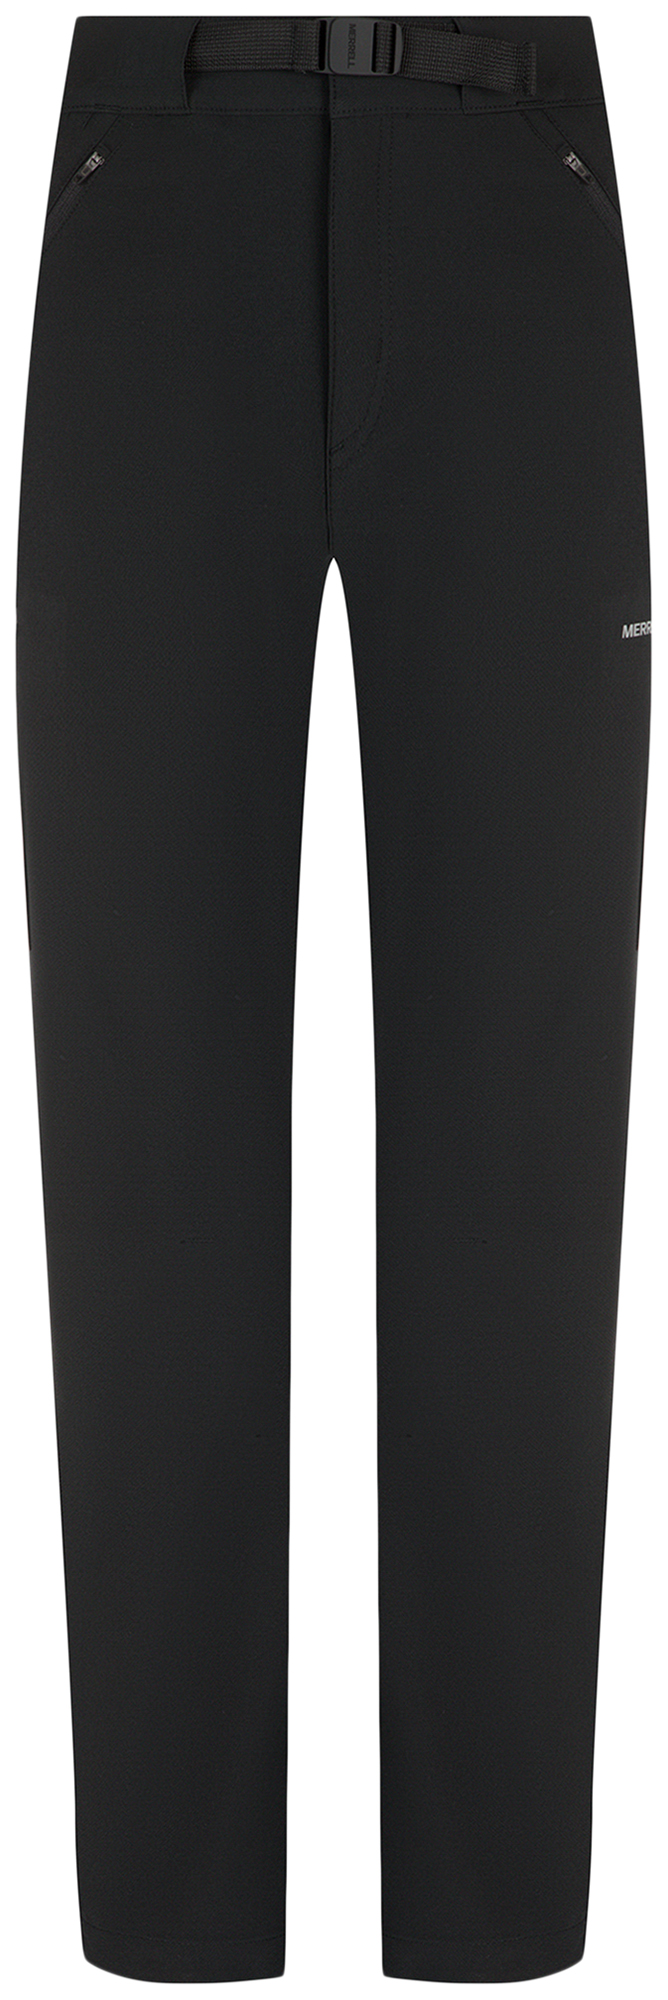 цена на Merrell Брюки женские Merrell, размер 46